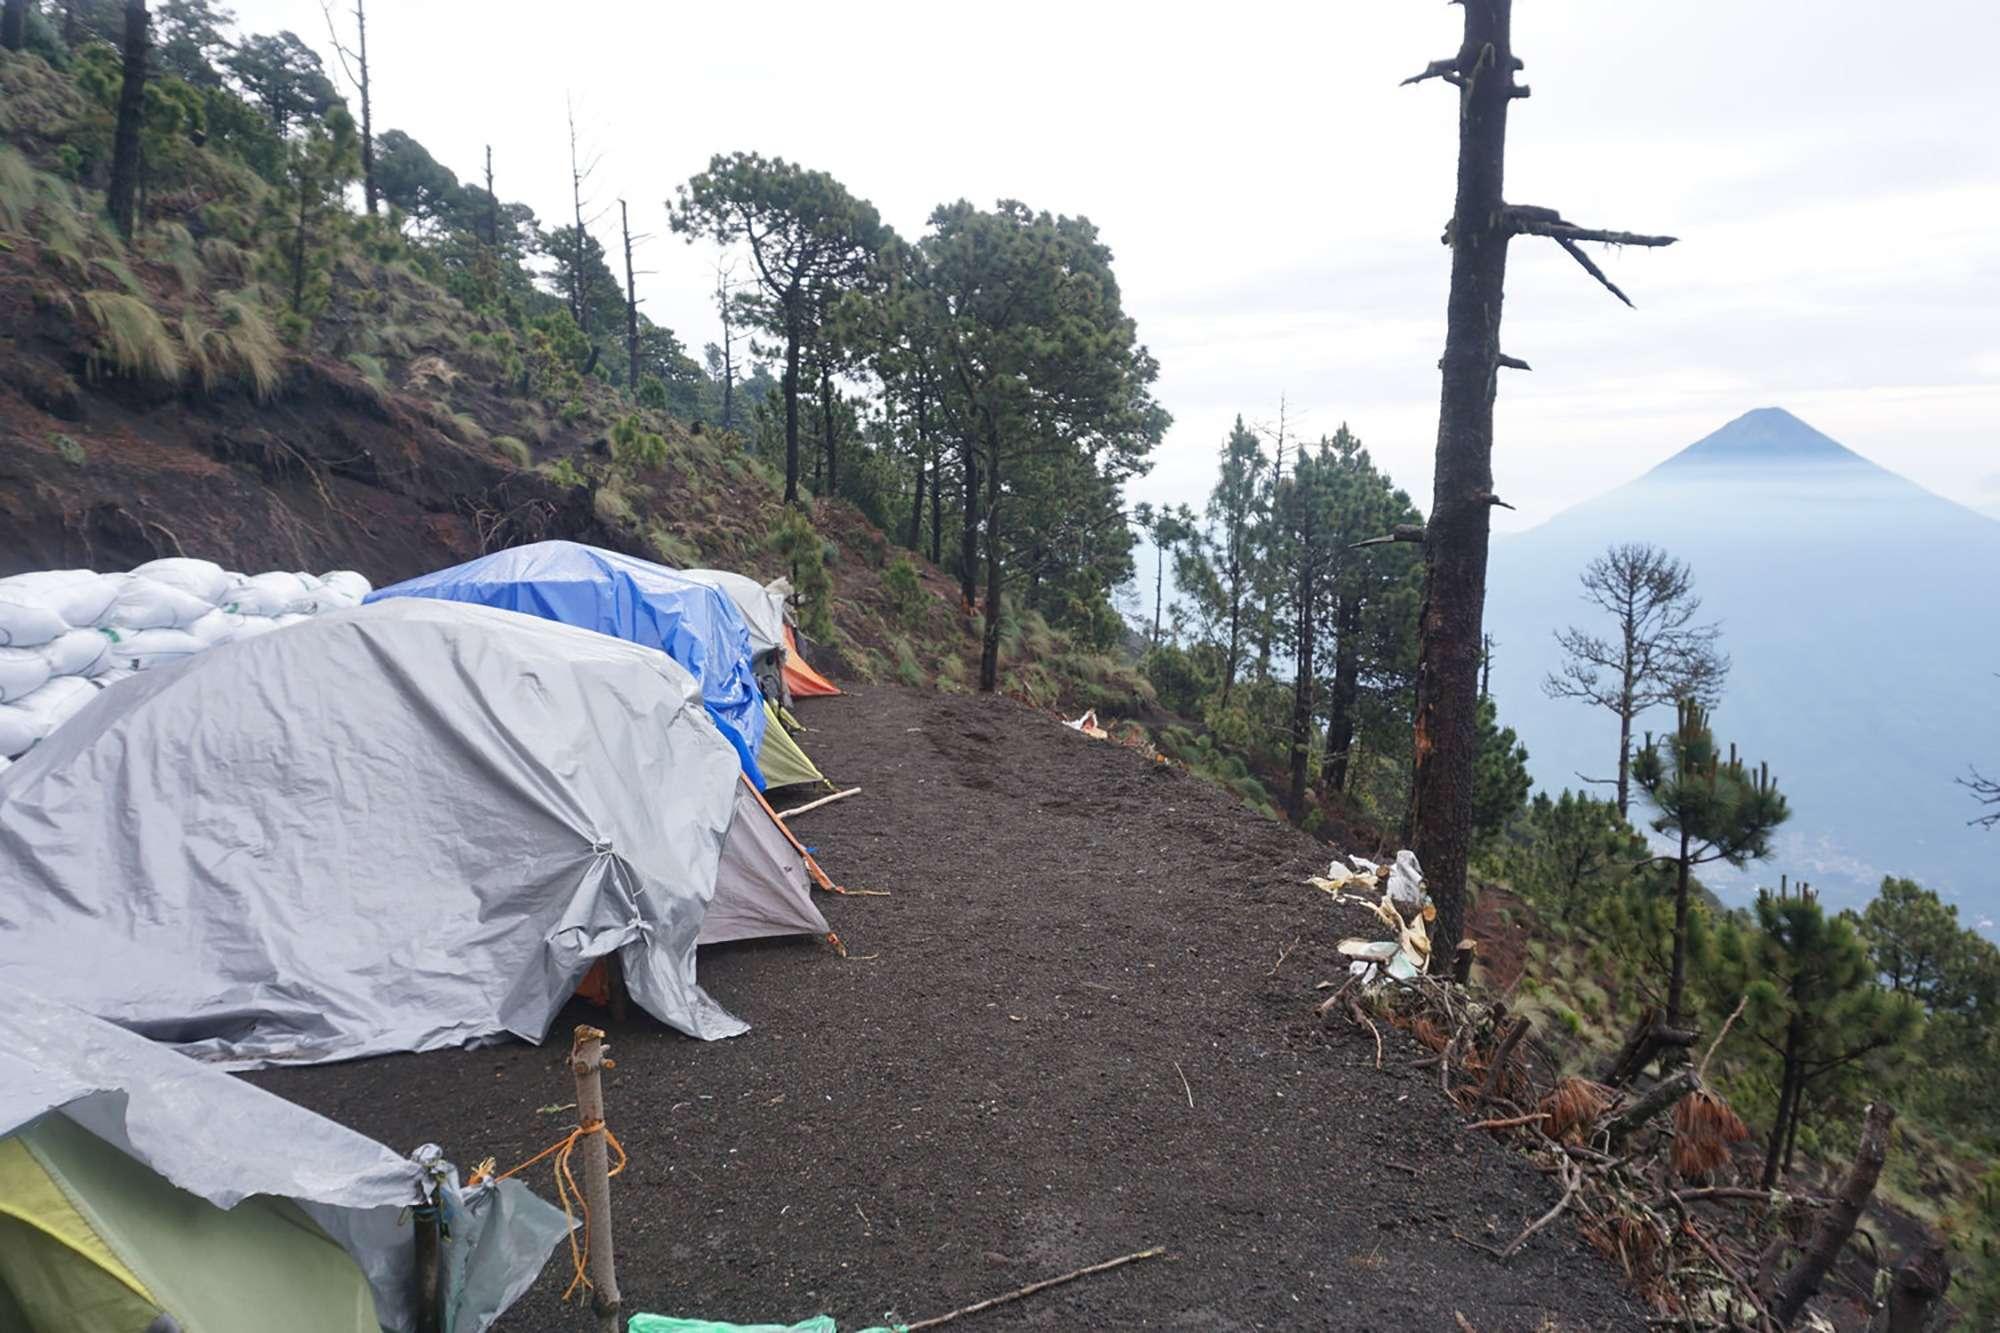 Soy Tours Base camp on Acatenango volcano in Guatemala